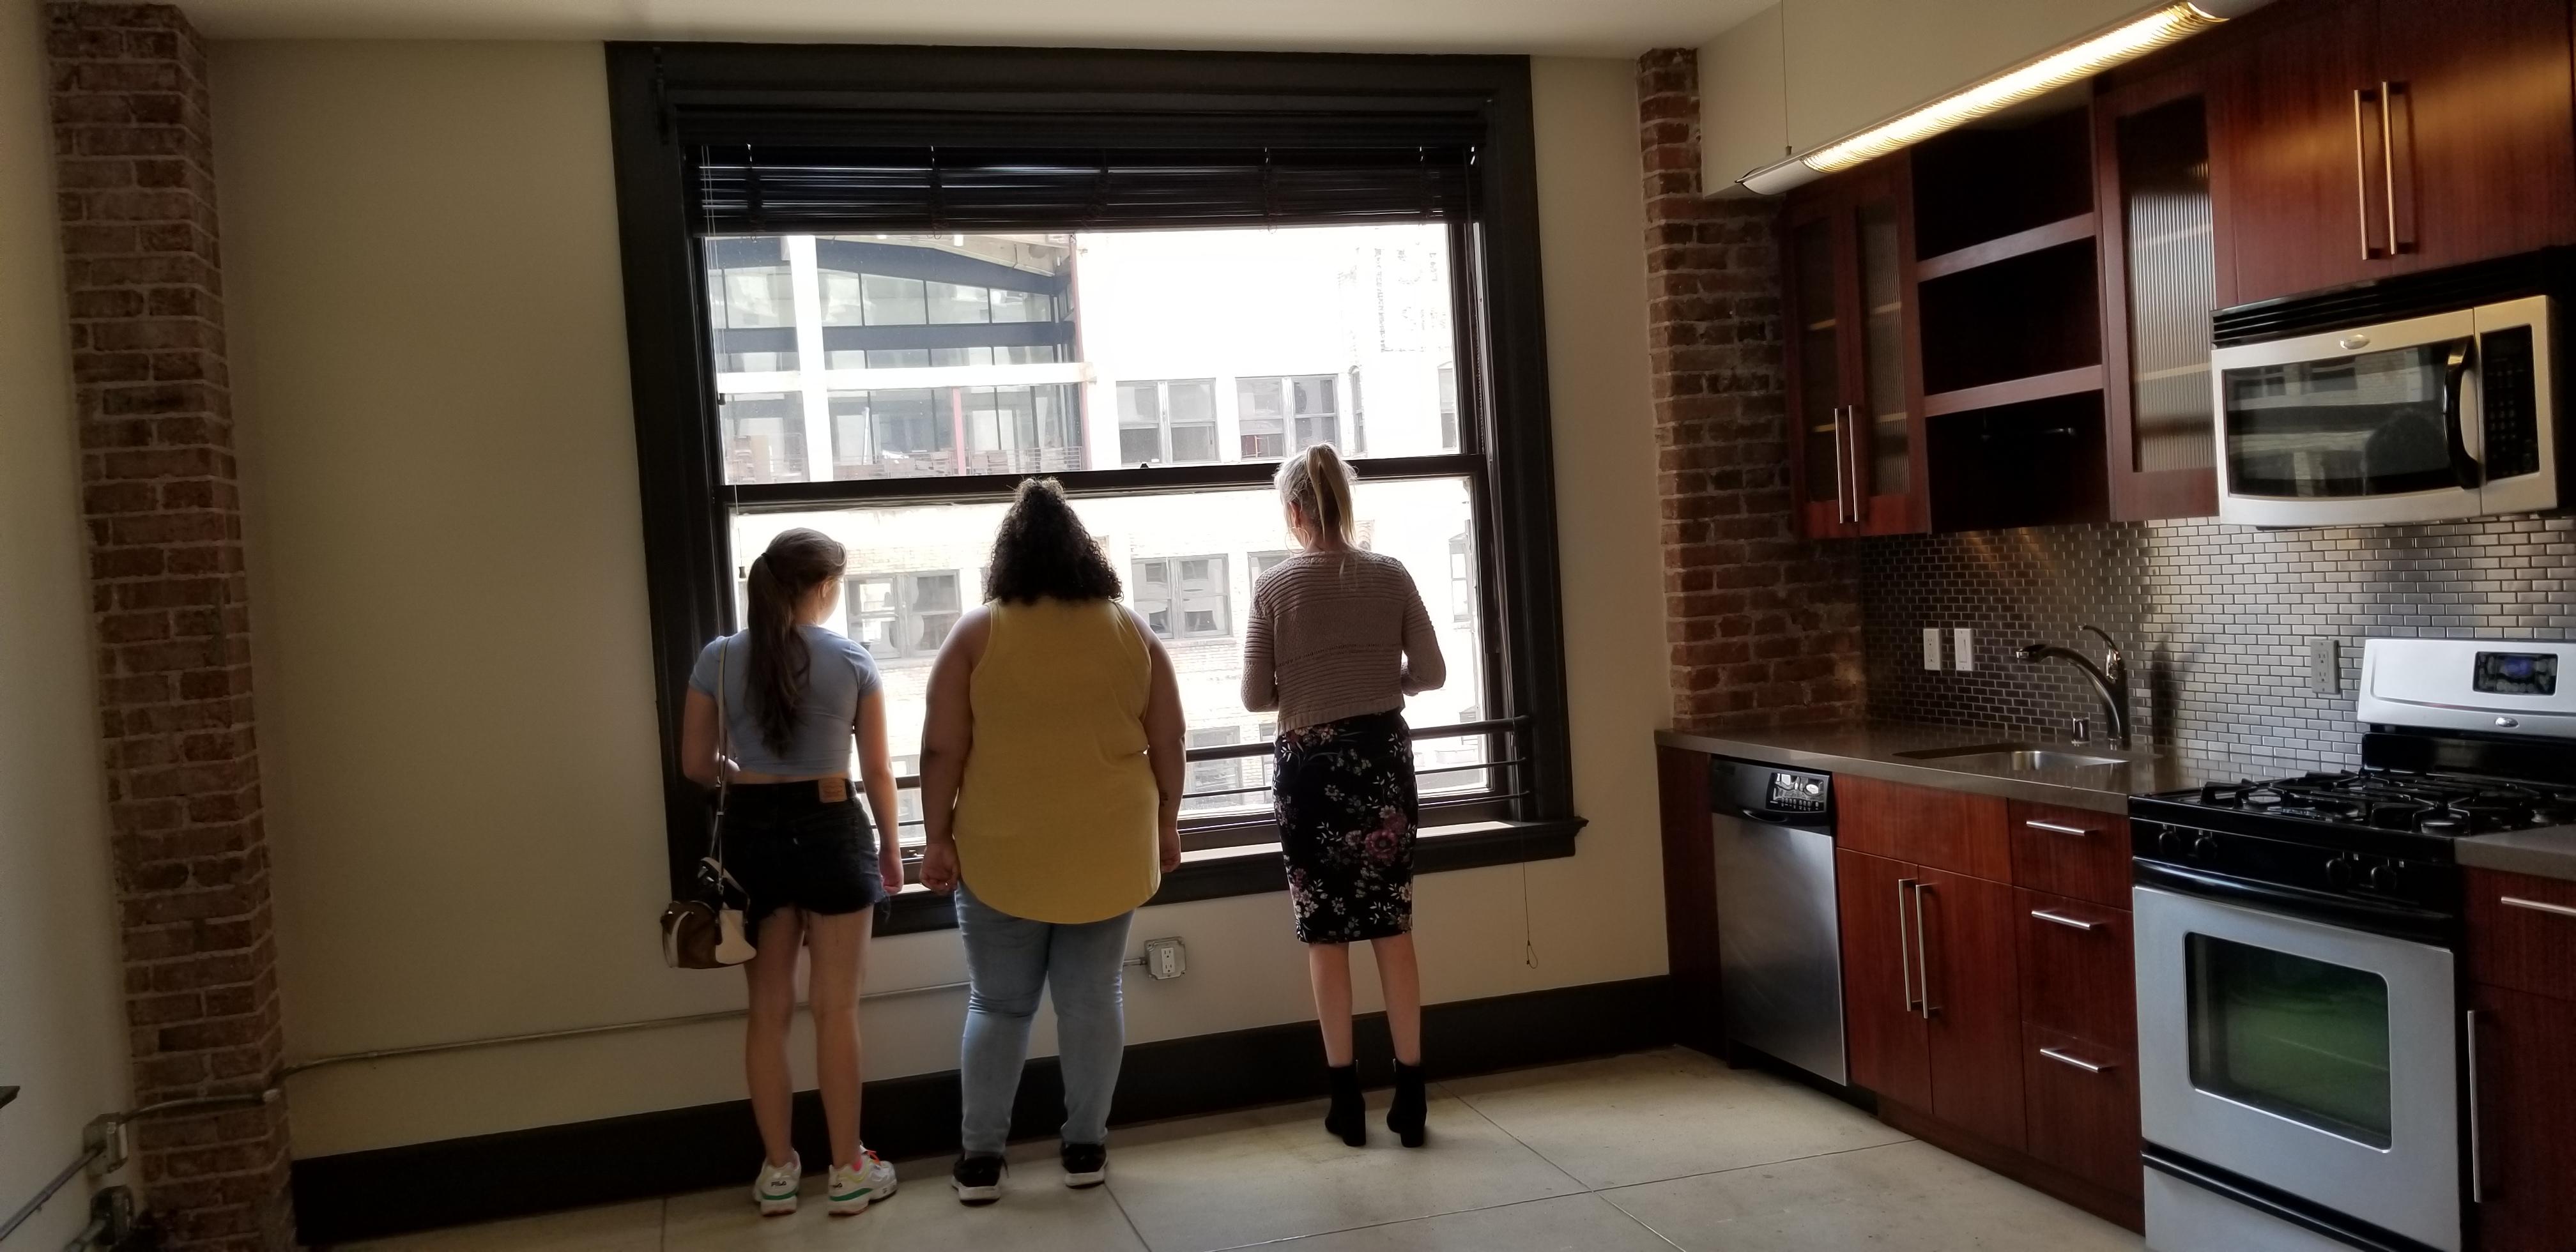 Students inside Chapman Flats apartment.